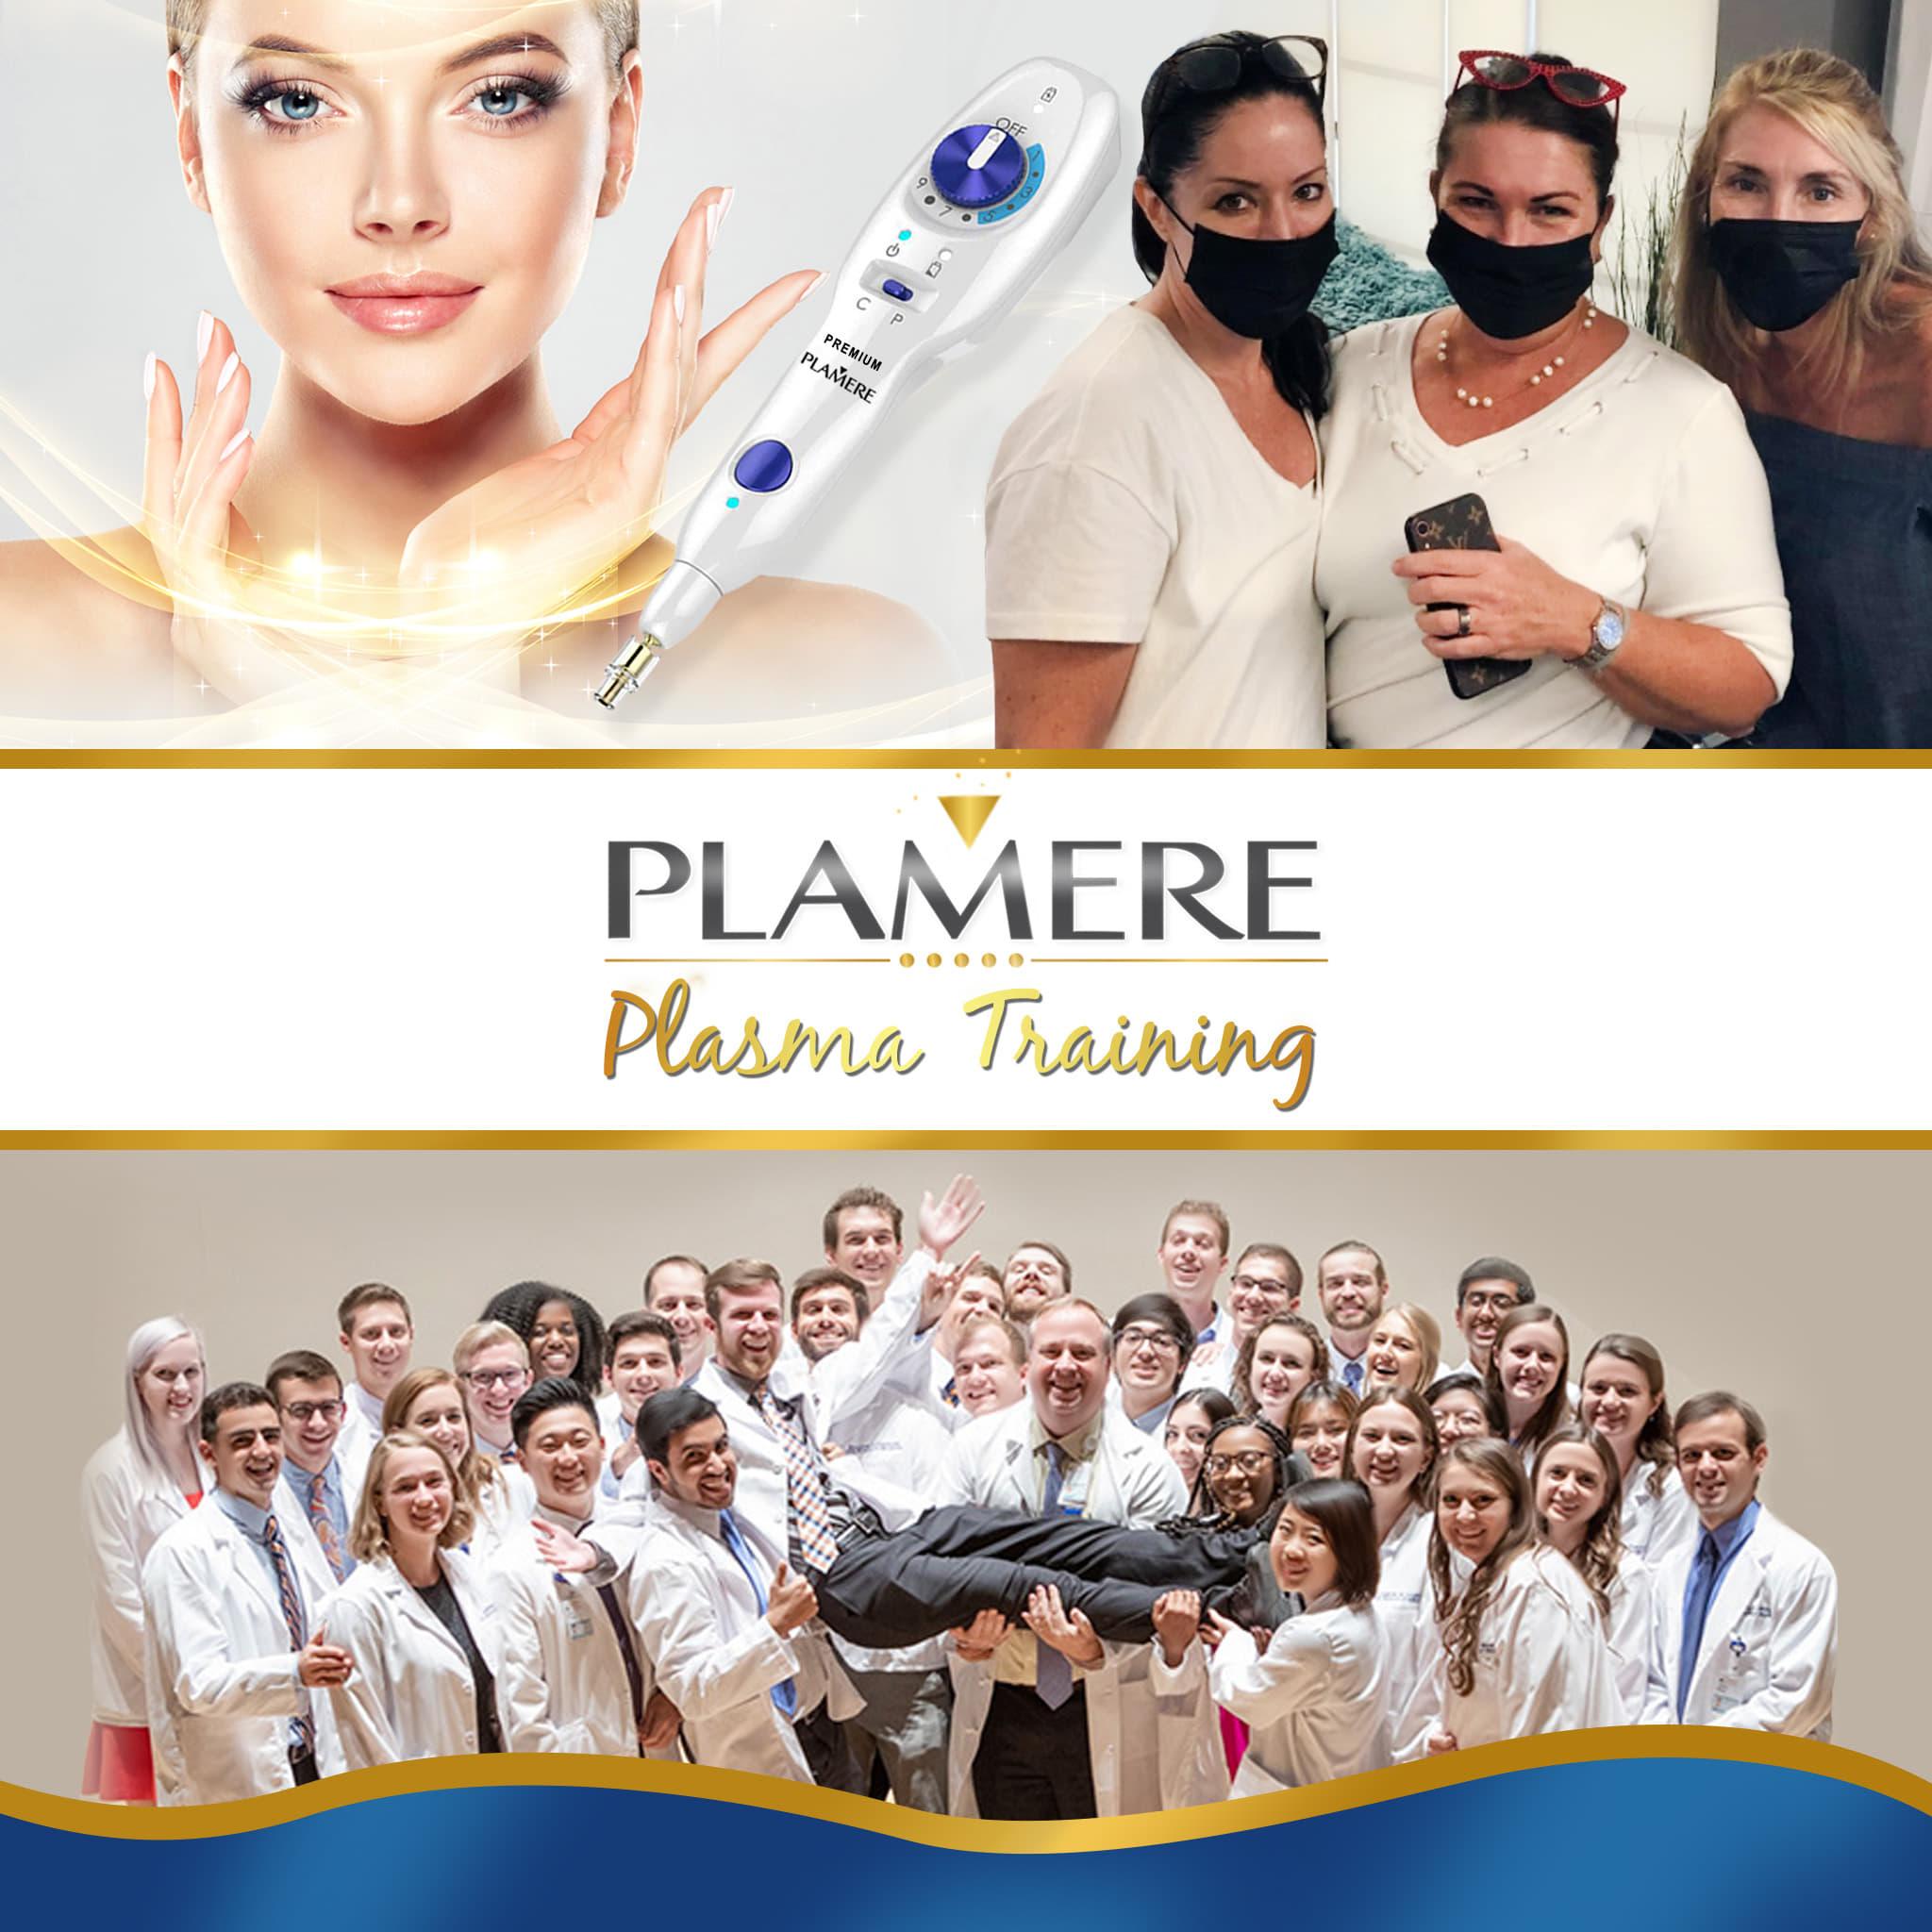 Plamere Plasma Fibroblast Online Training